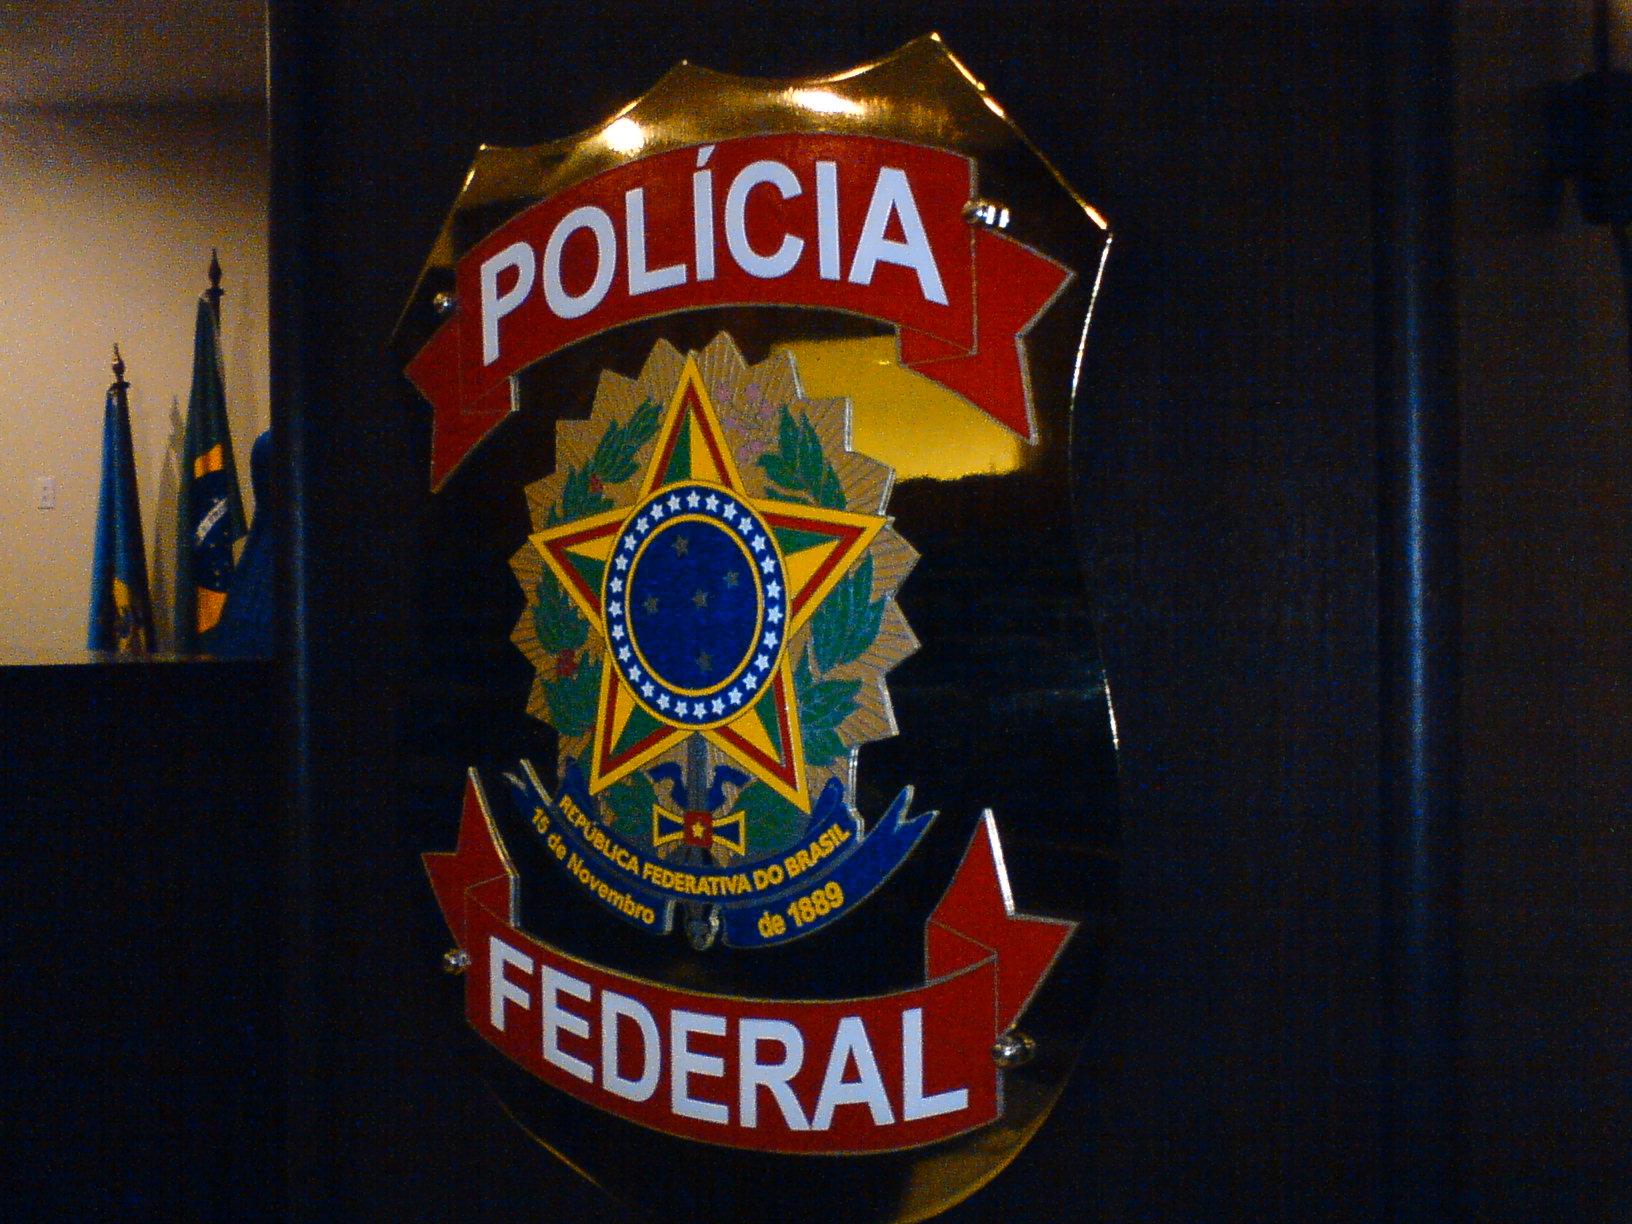 Policia_Federal 2014